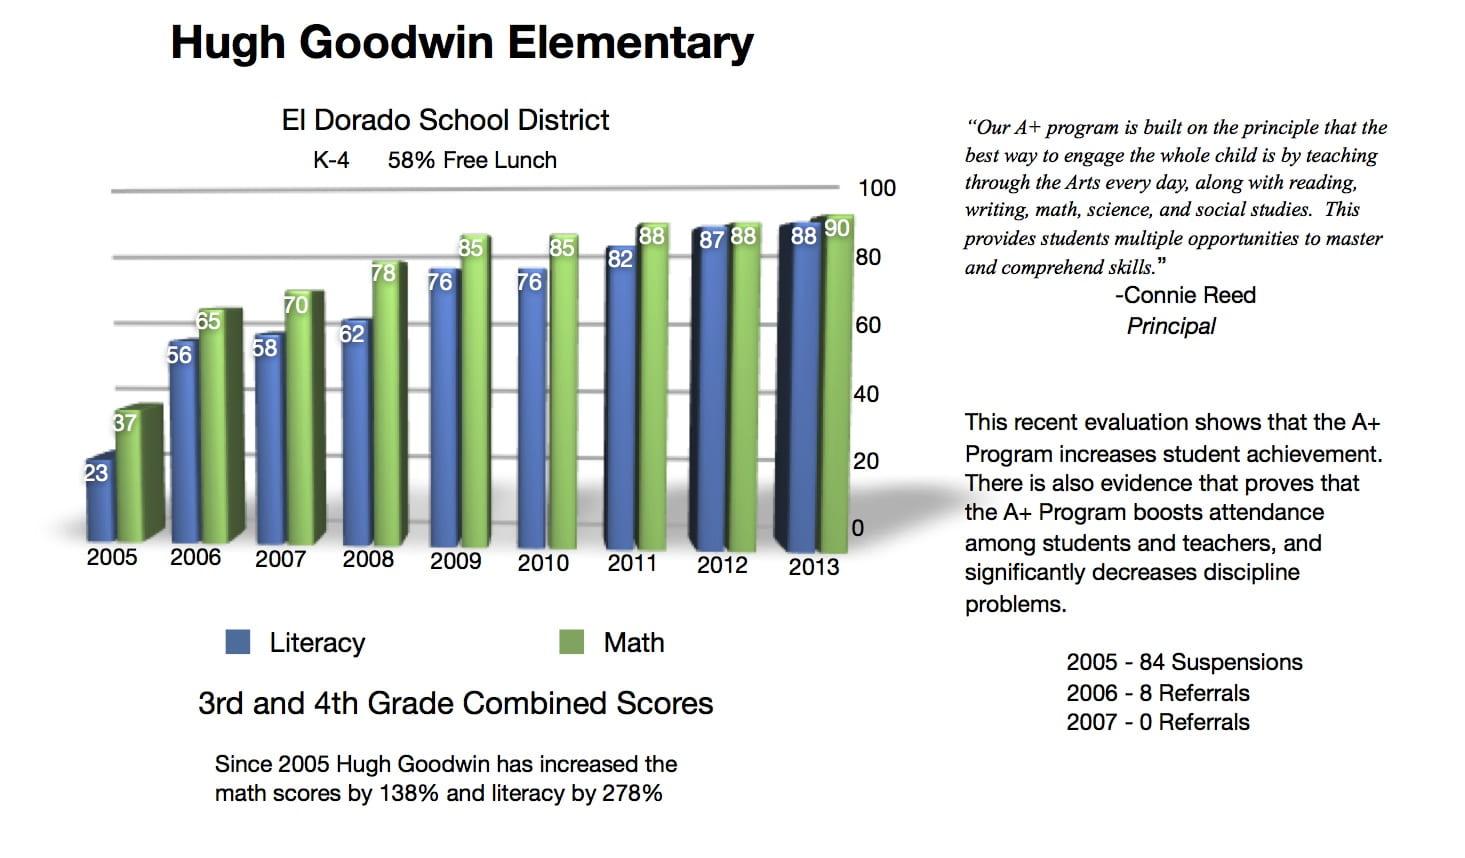 Chart on El Dorado's Hugh Goodwin Elementary School 2005-2007